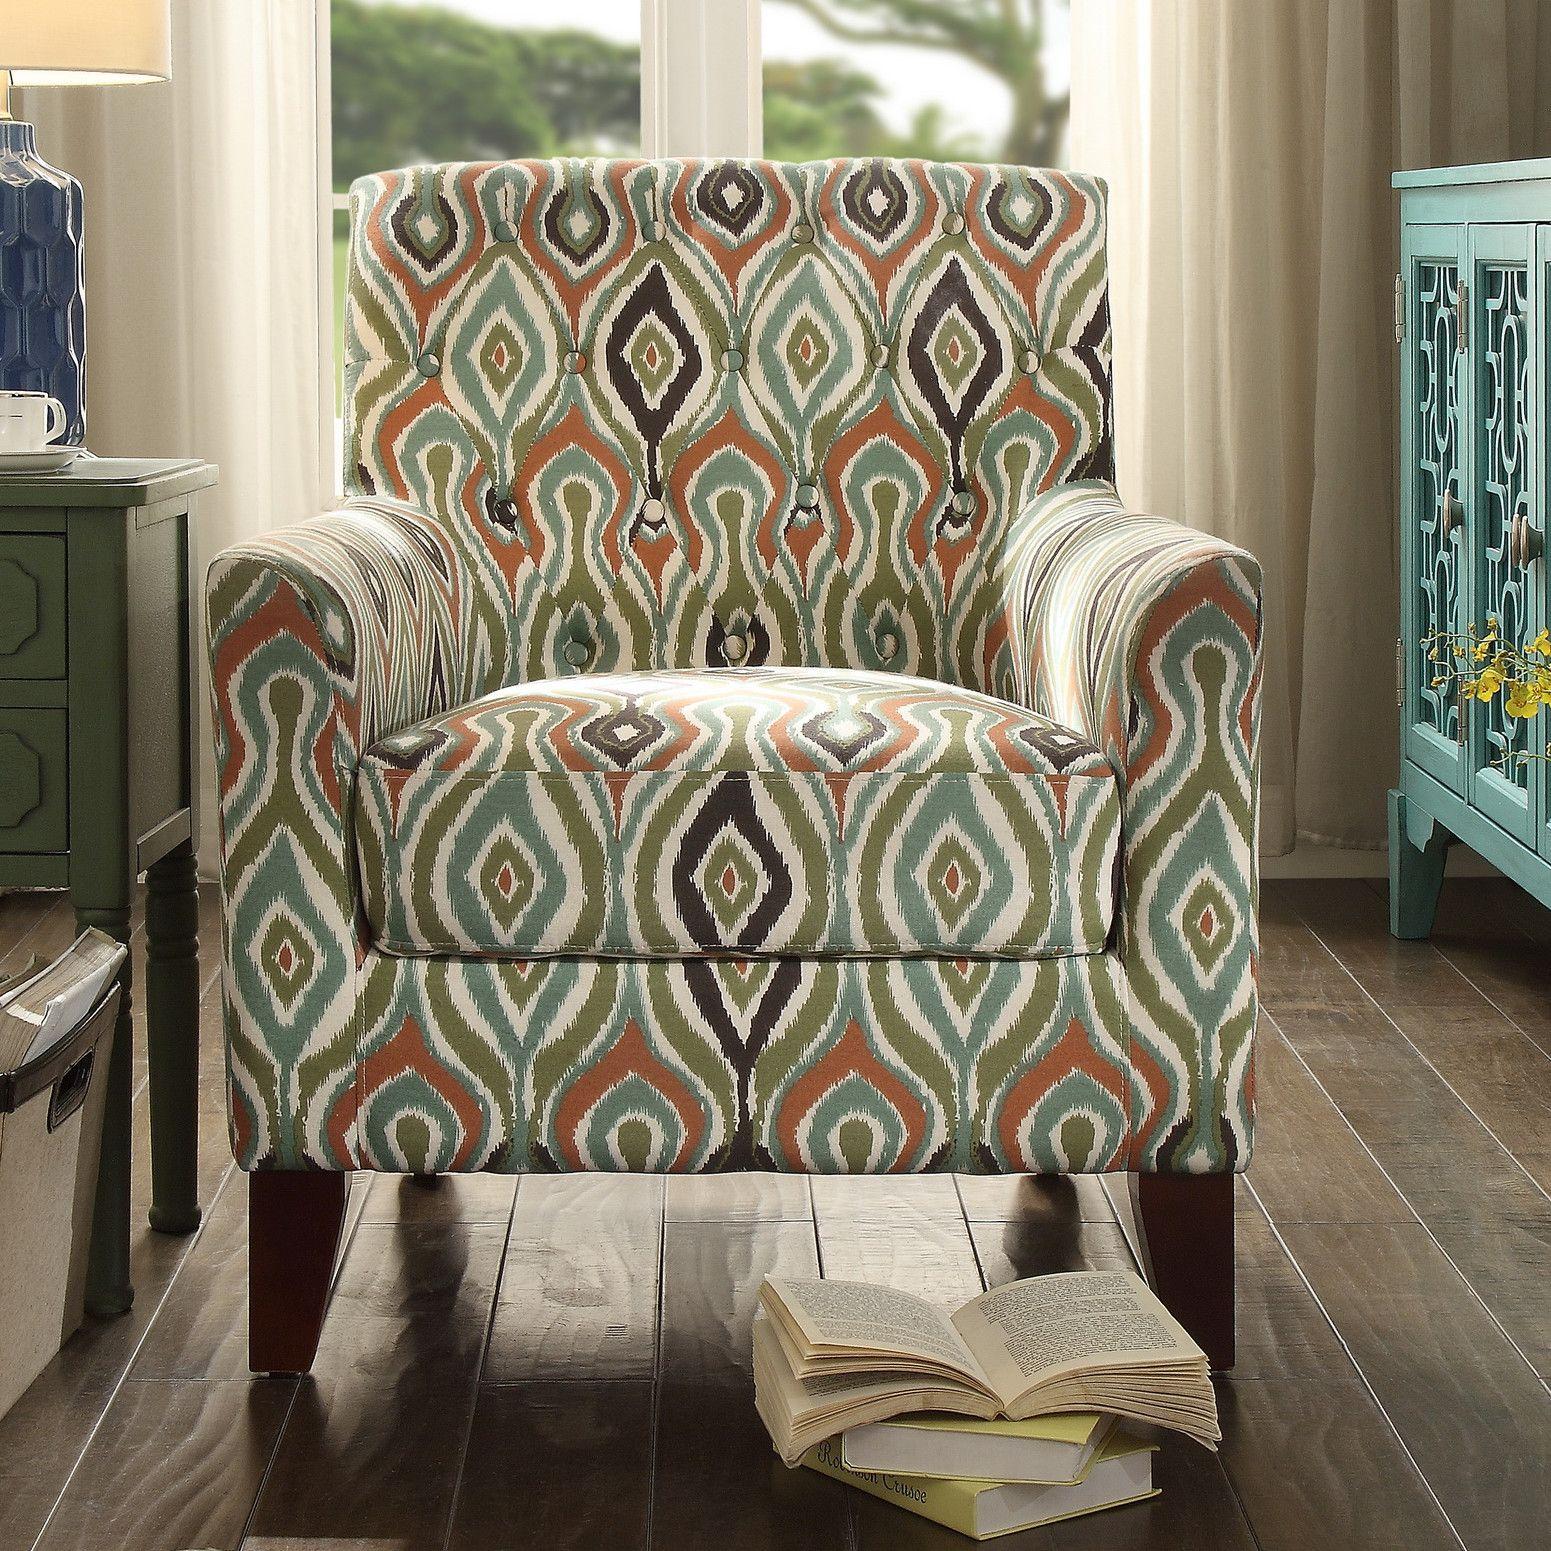 Popel Armchair | Tufted Arm Chair, Tufted Club Chairs, Armchair Regarding Popel Armchairs (View 3 of 15)